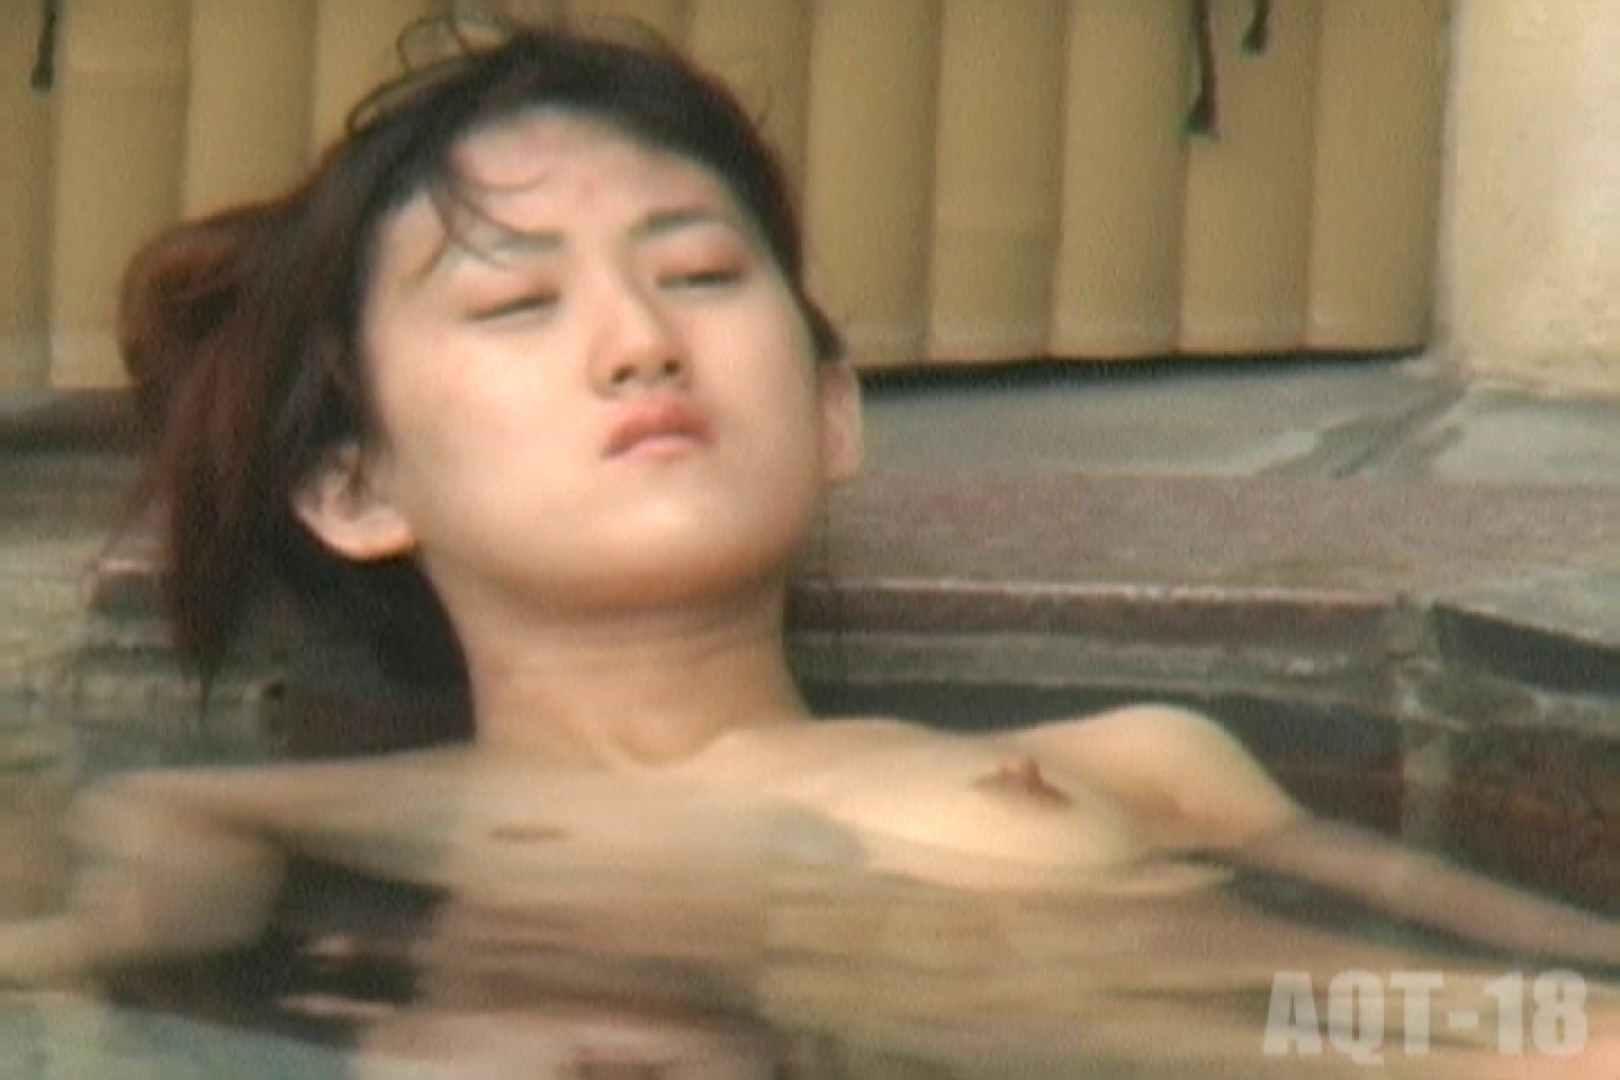 Aquaな露天風呂Vol.862 盗撮 AV無料動画キャプチャ 92PICs 68